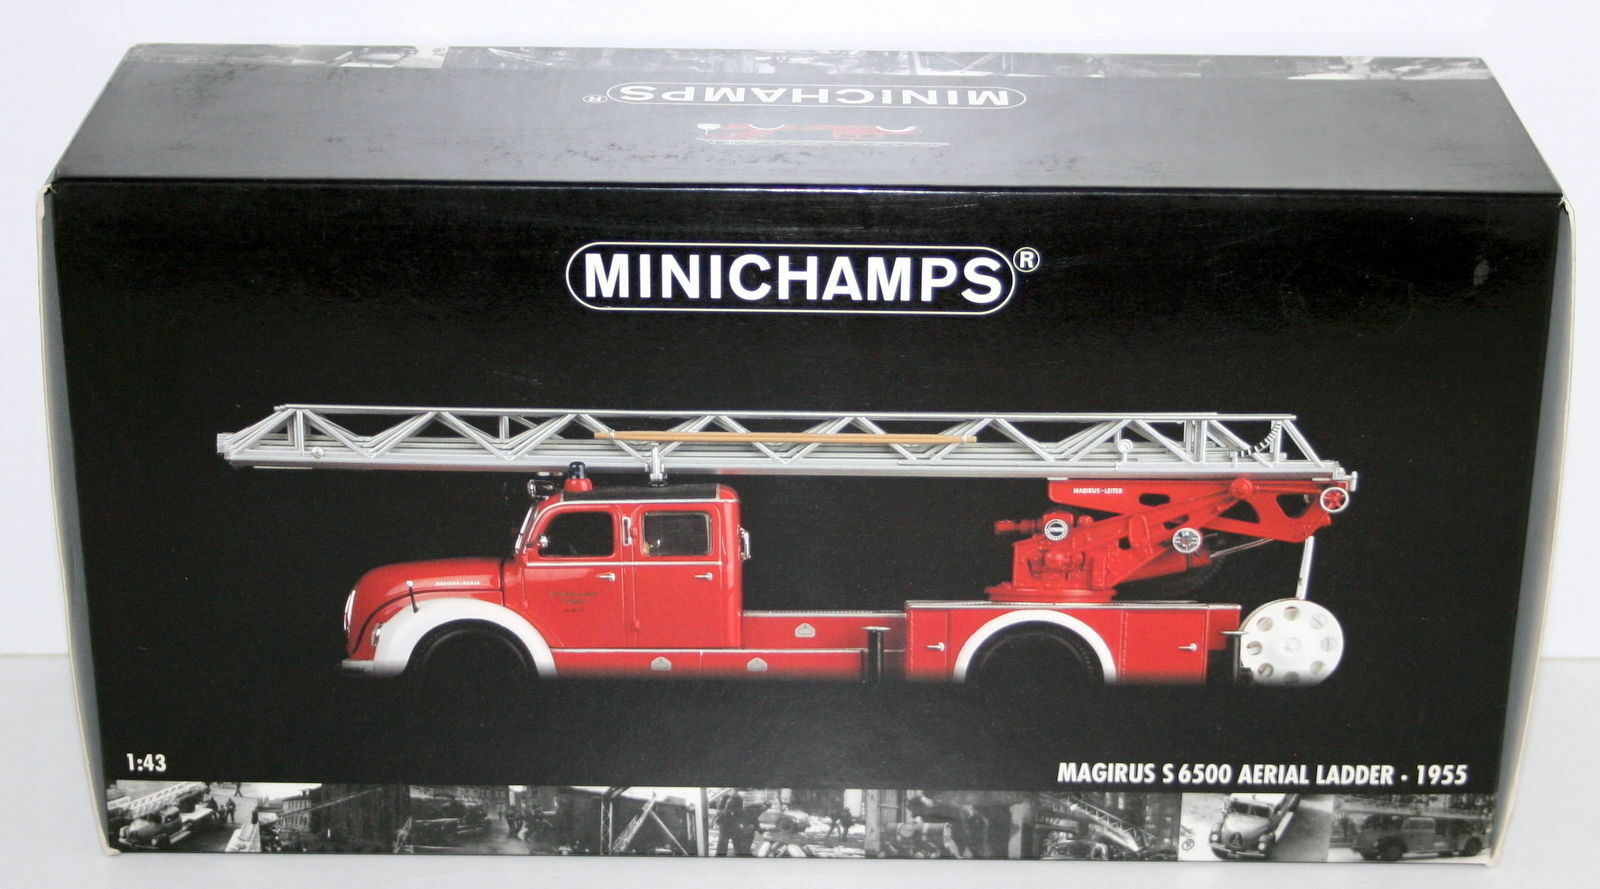 Minichamps 1 43 - 439 140071 Magirus S 6500 Aerial Ladder Red White 1955